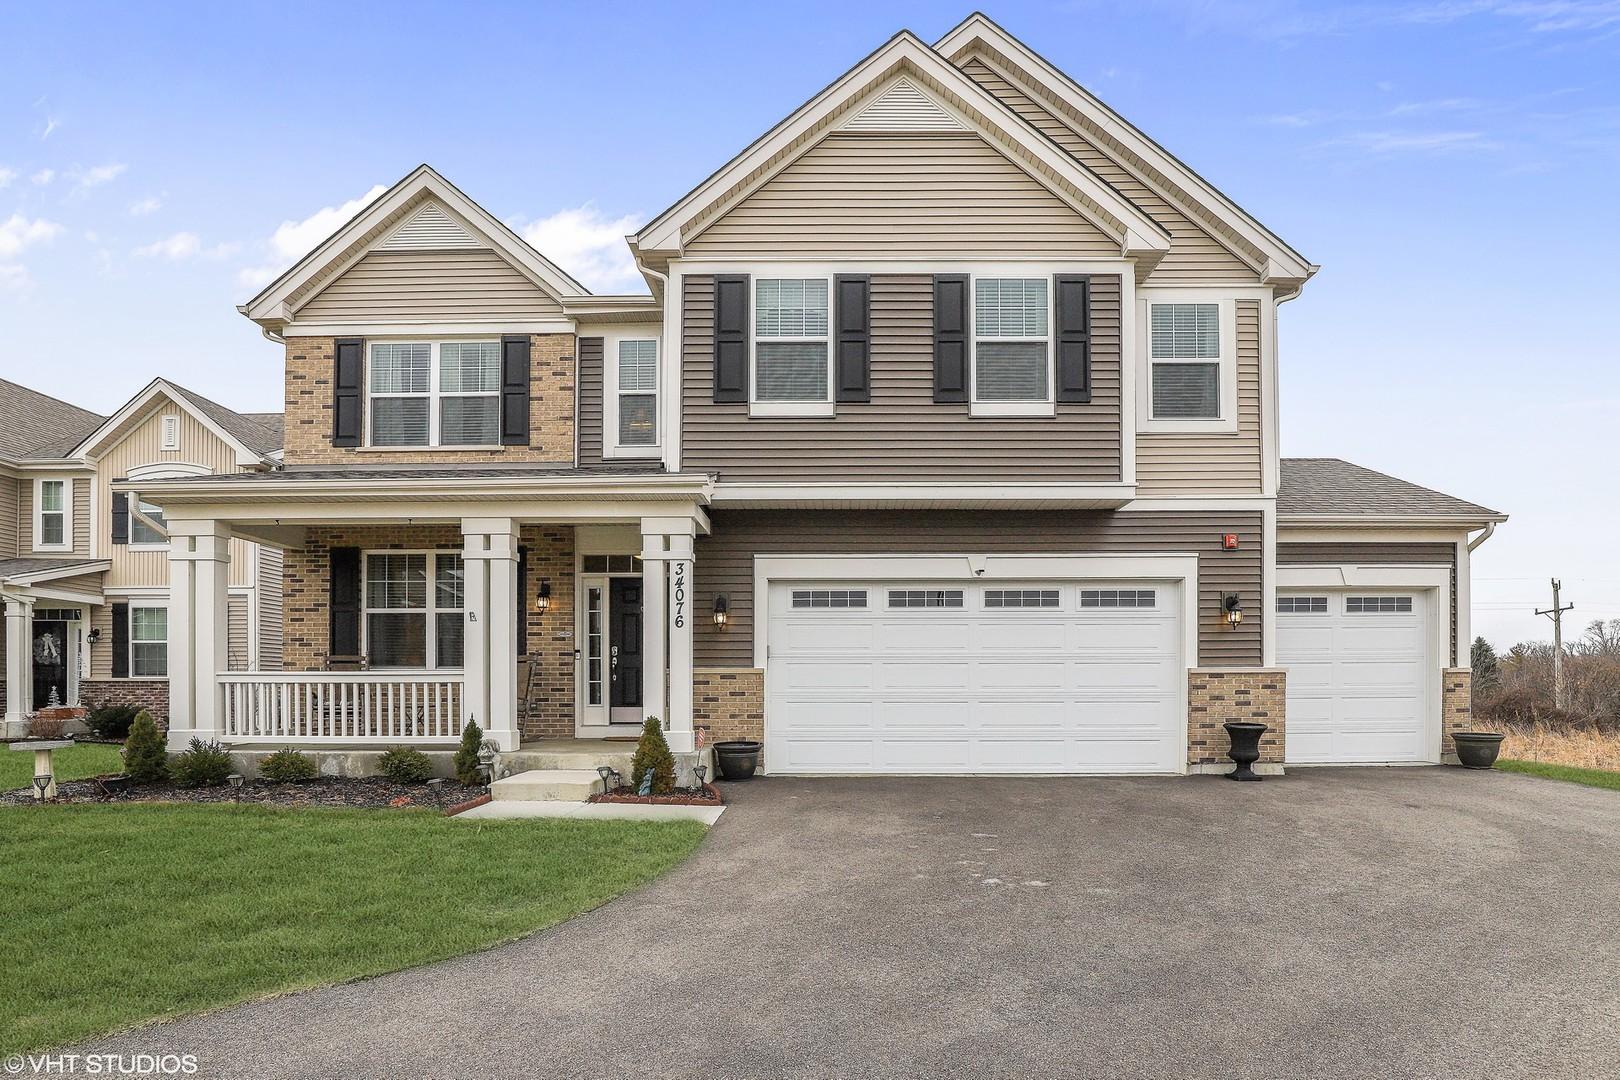 34076 North Jenna Lane, Gurnee, Illinois 60031